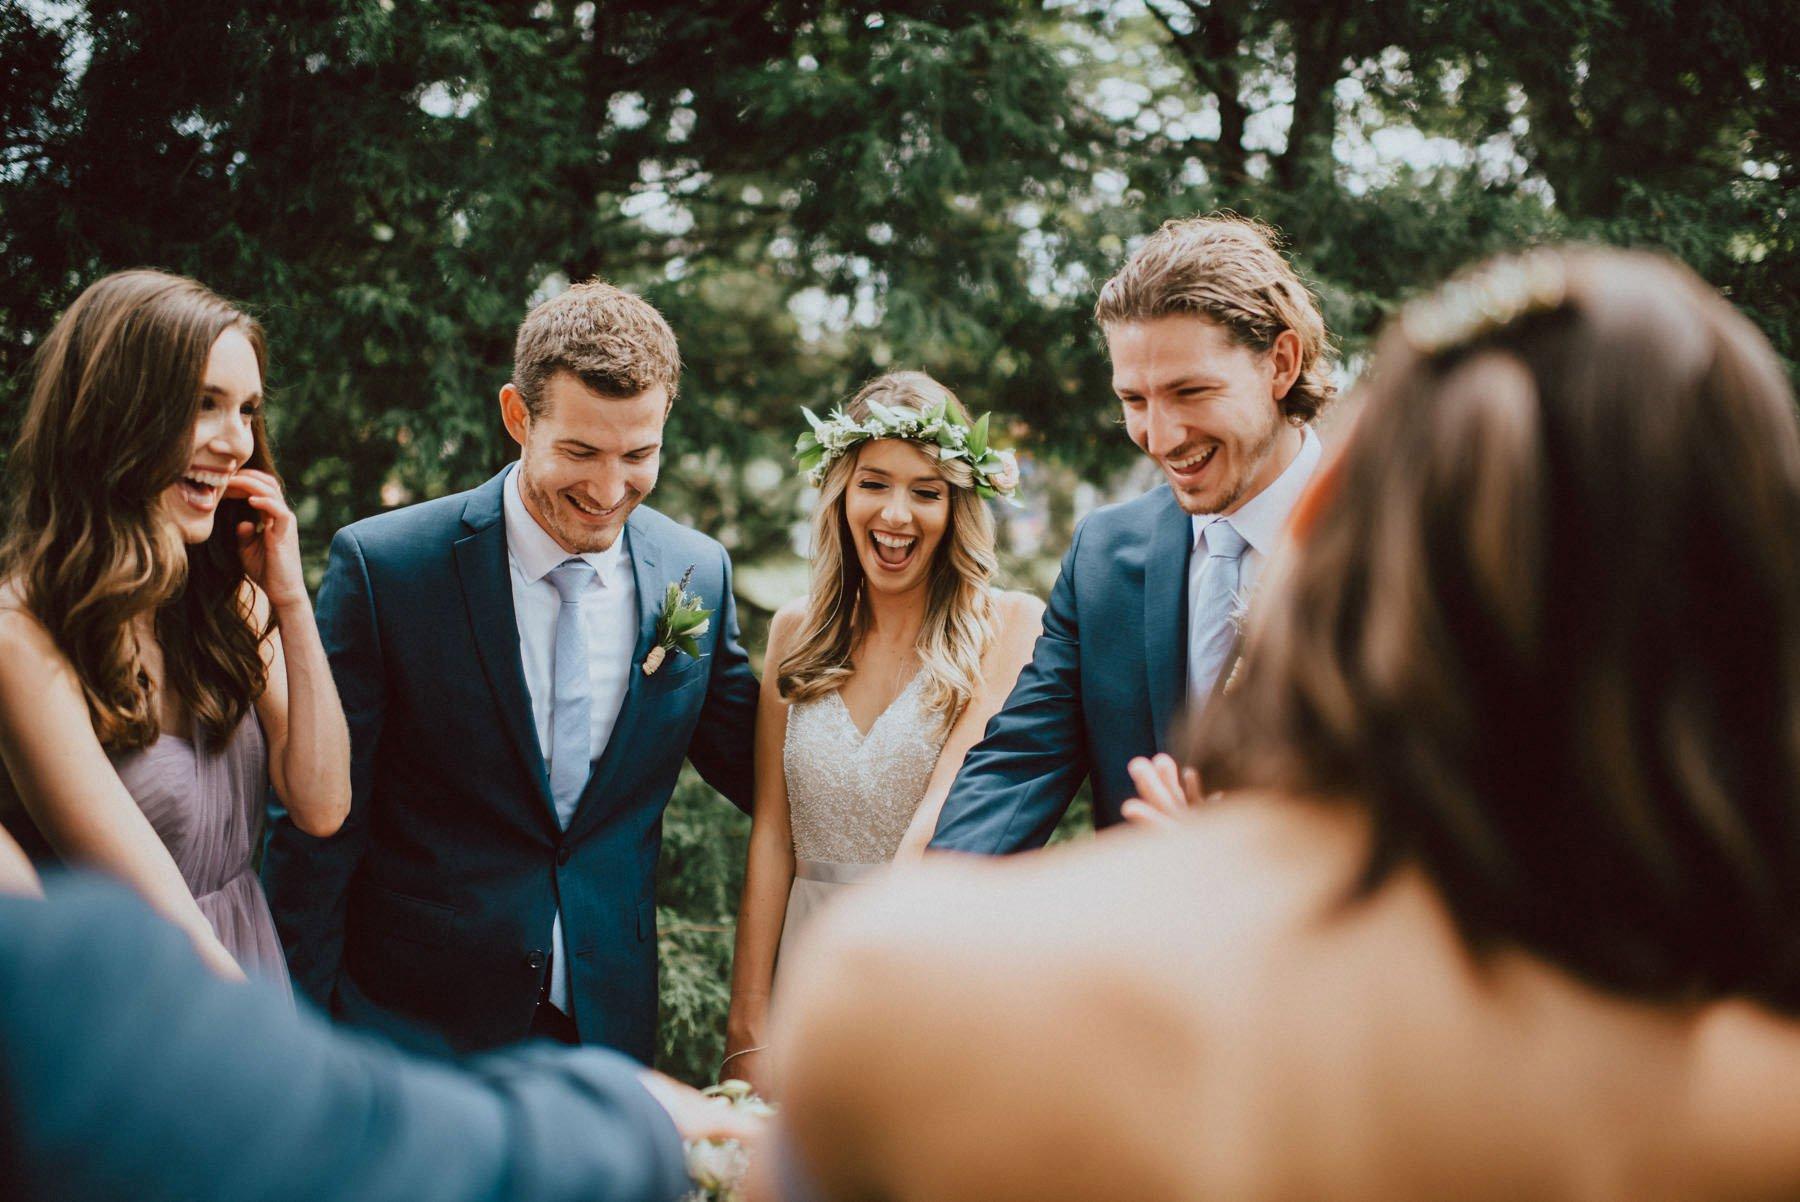 Knowlton-mansion-wedding-67.jpg